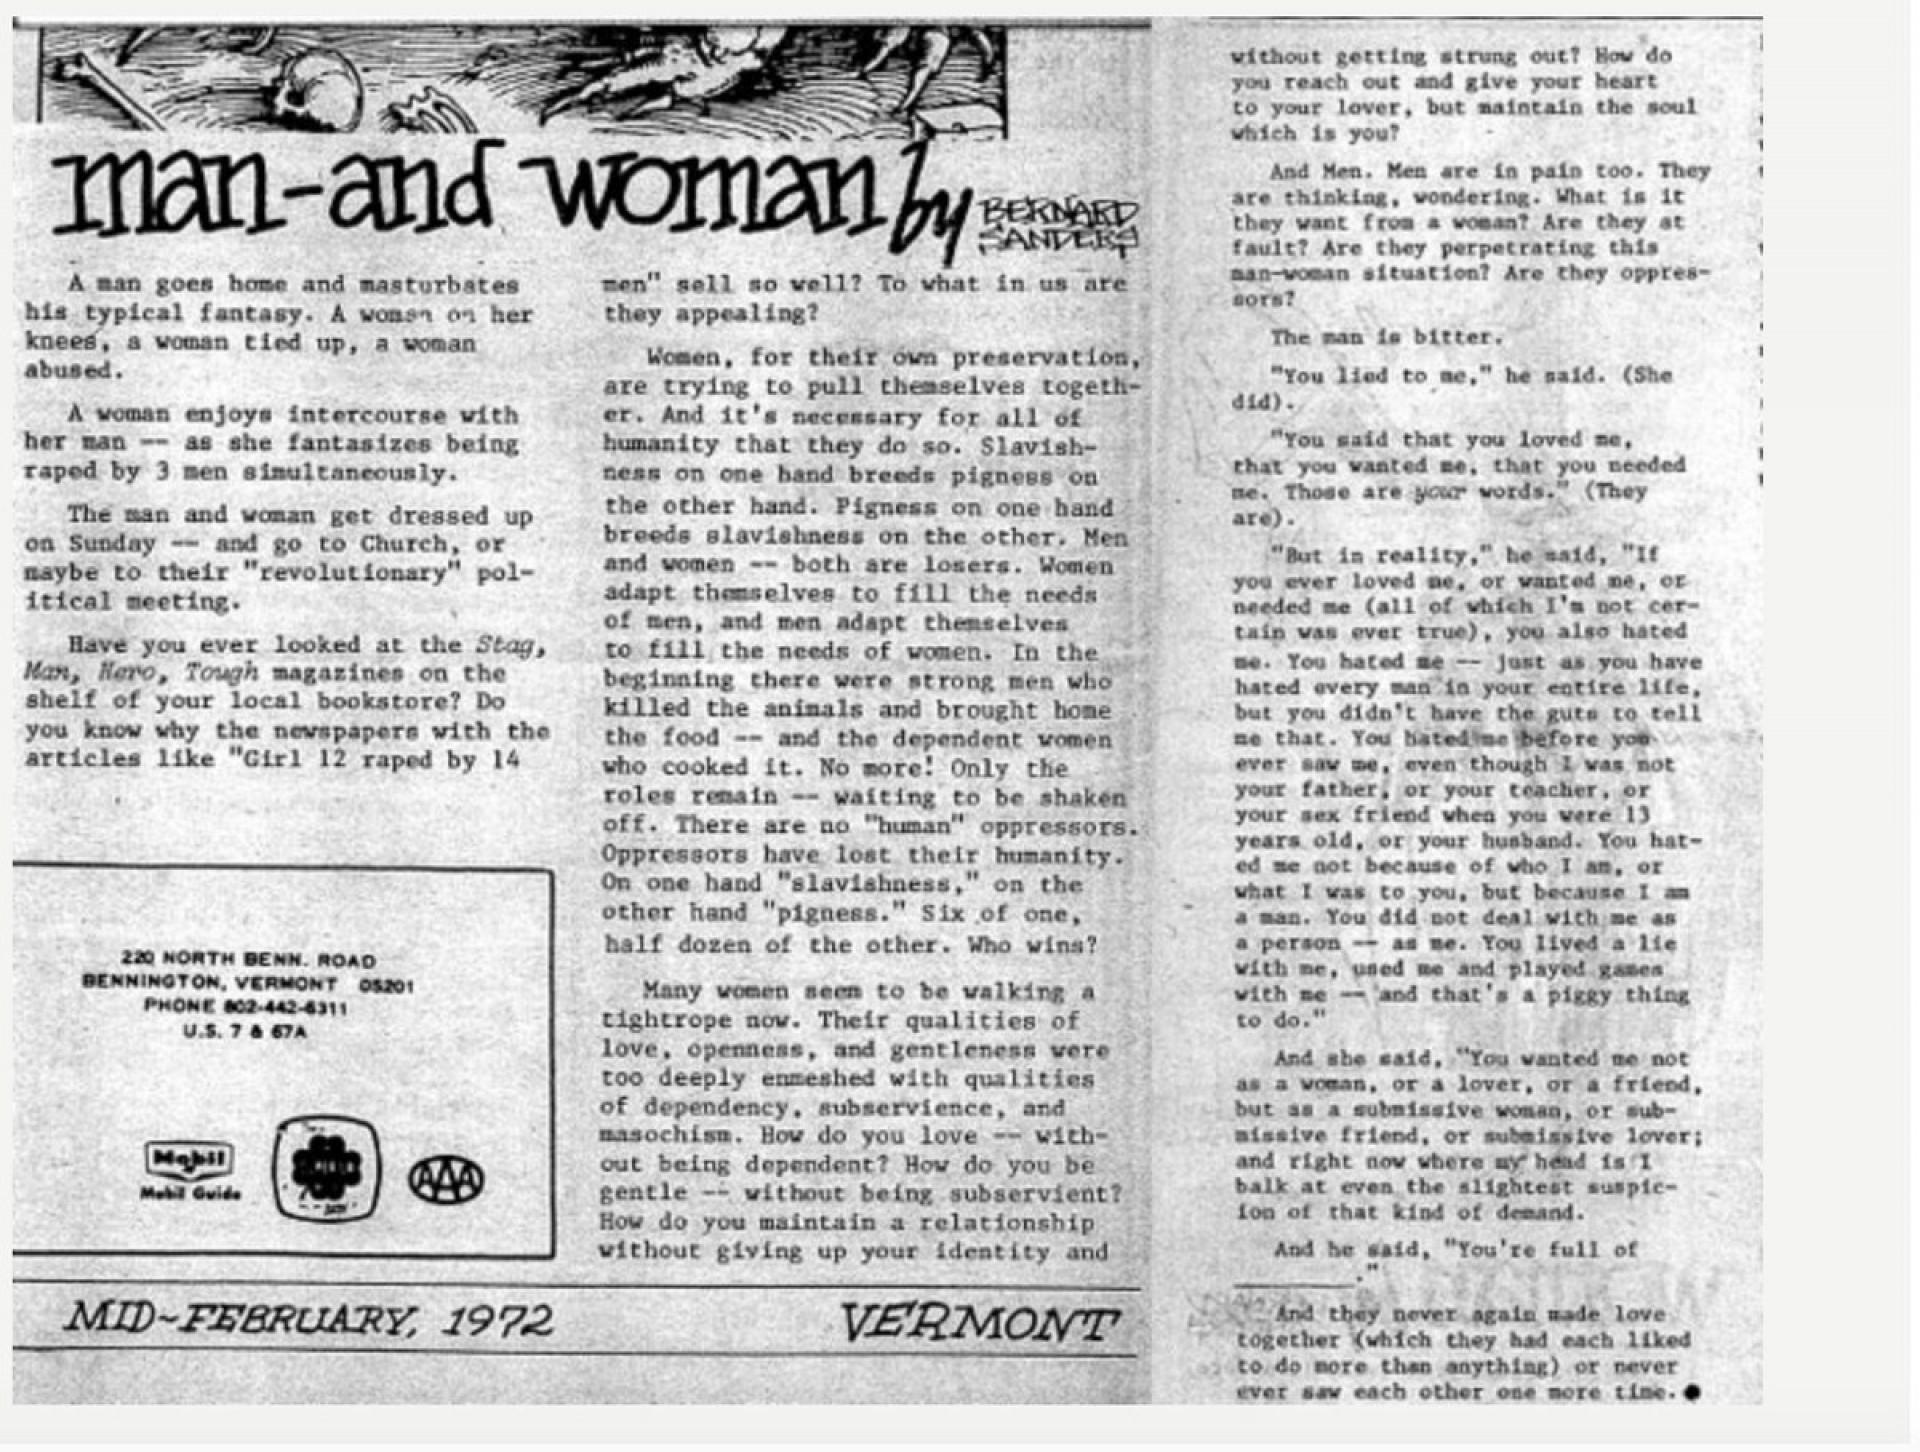 006 Dot Kpxvaaevq02 Bernie Sanders Rape Essay Phenomenal 1920